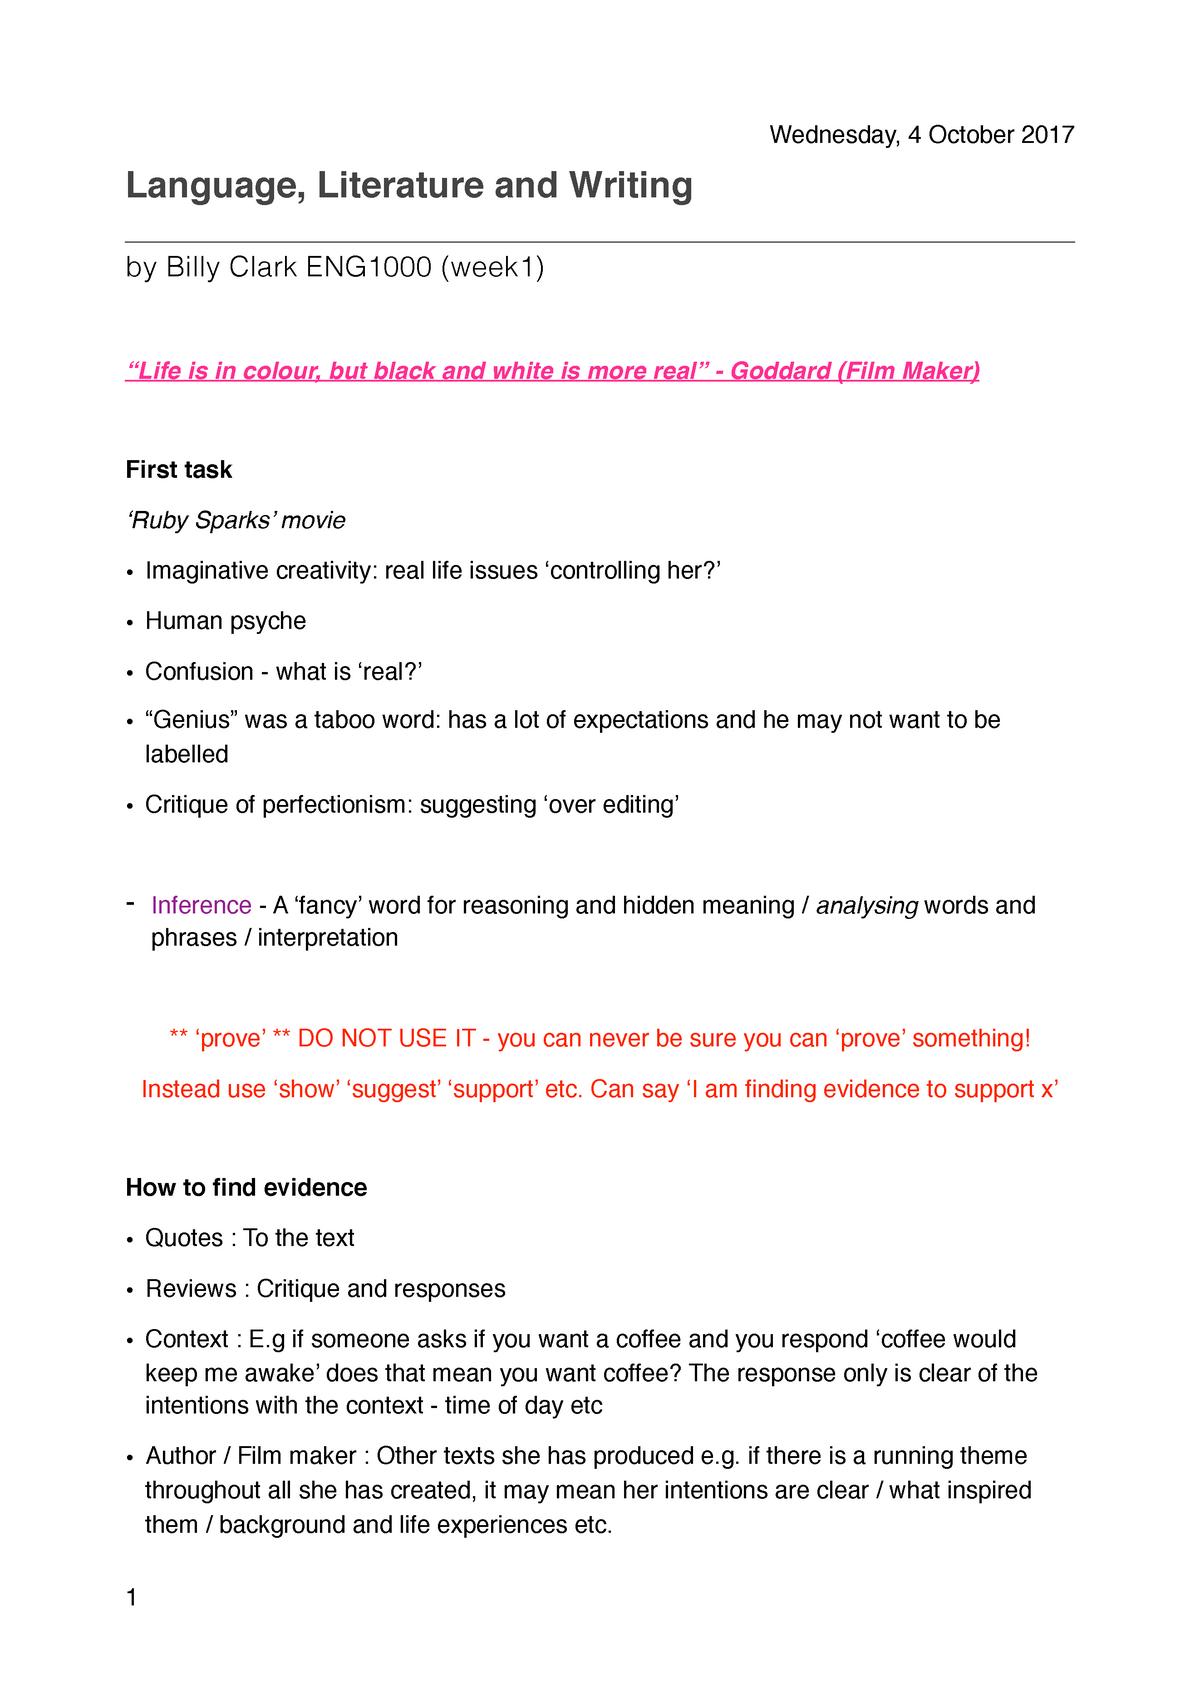 Week 1 Notes - language literature and writing - ENG1000